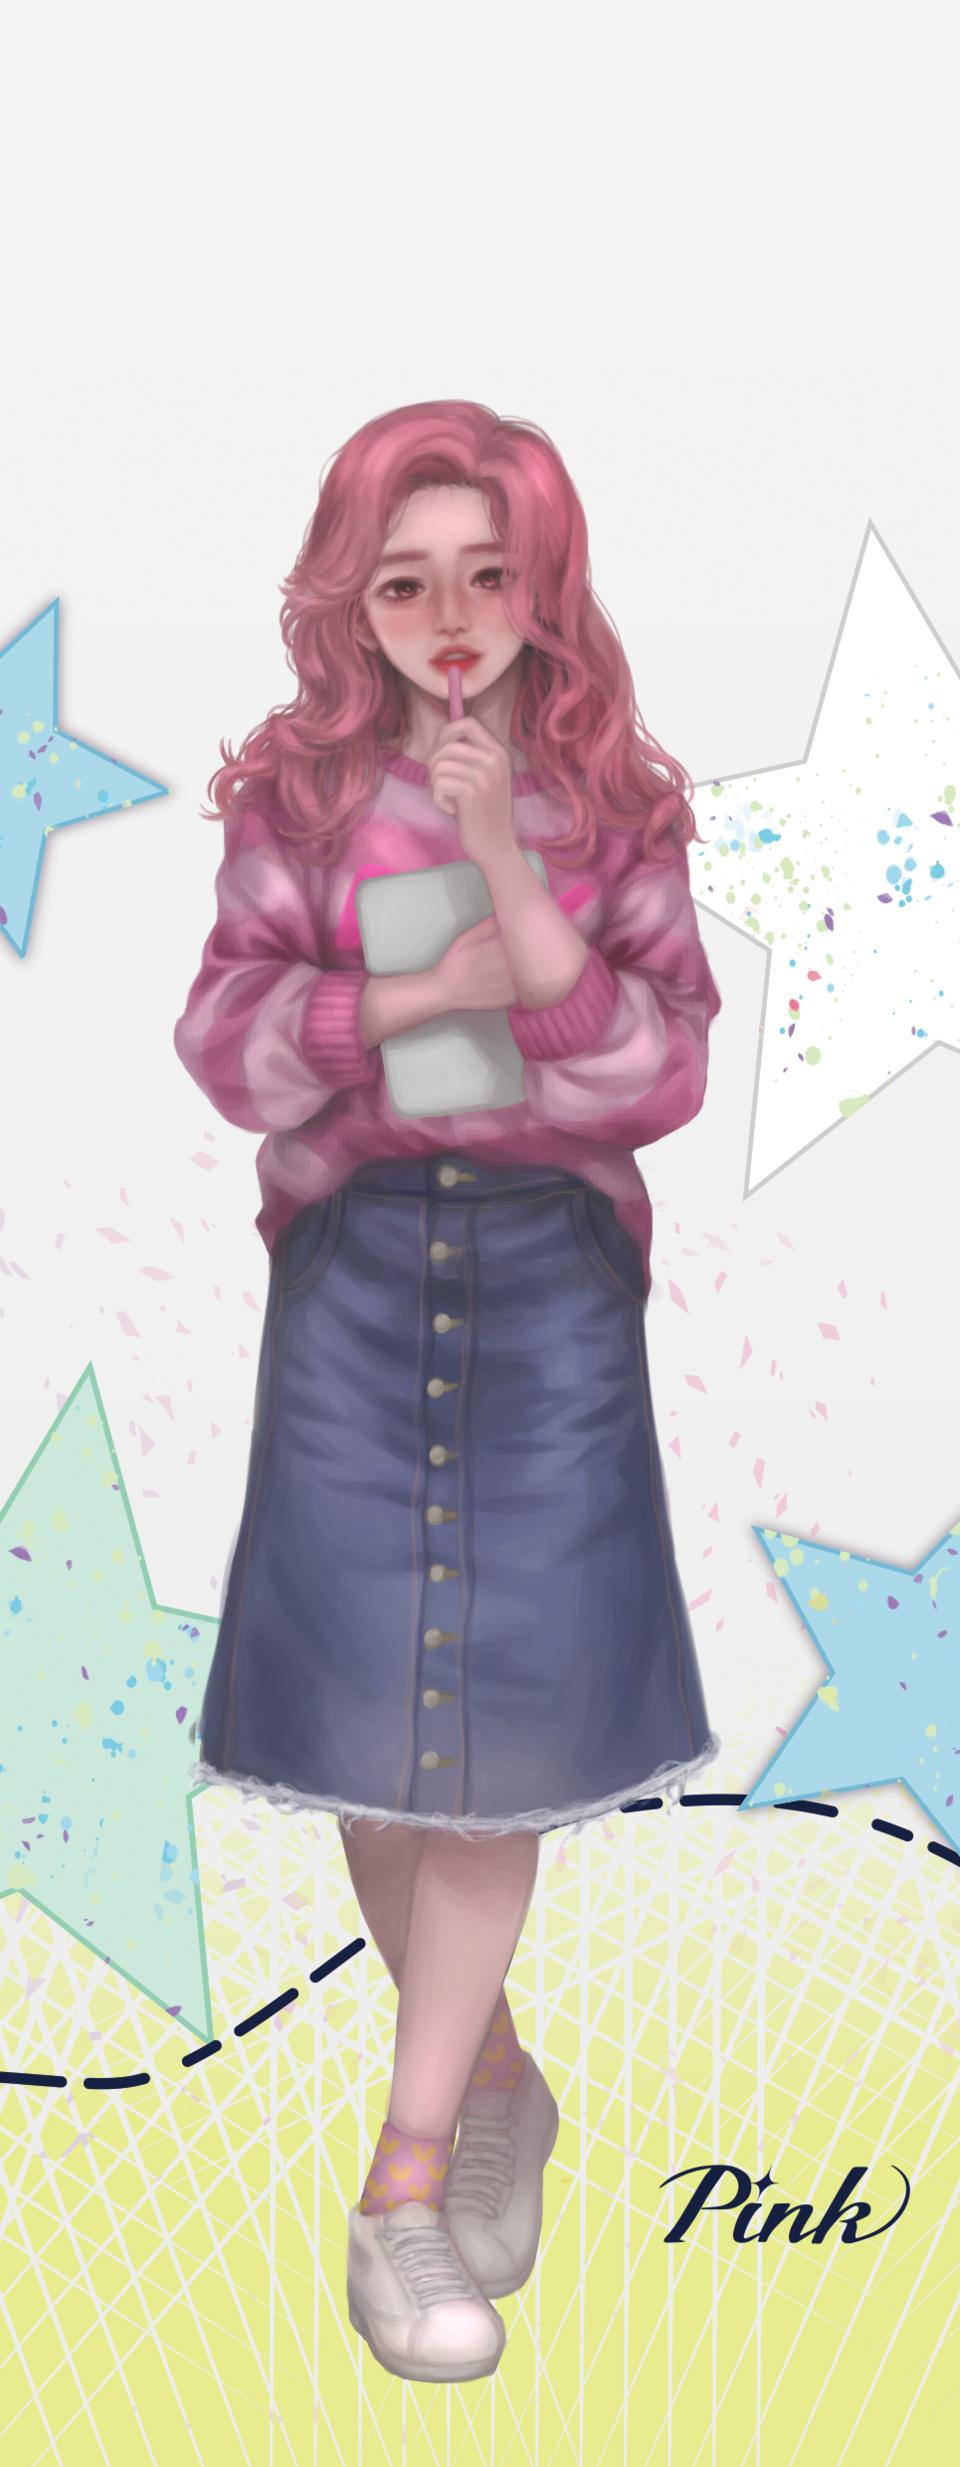 PASTEL SKETCH Package Illustration: Dreaming Pink Illust of ETOK PASTEL_SKETCH pastelpink girl dreaming pink